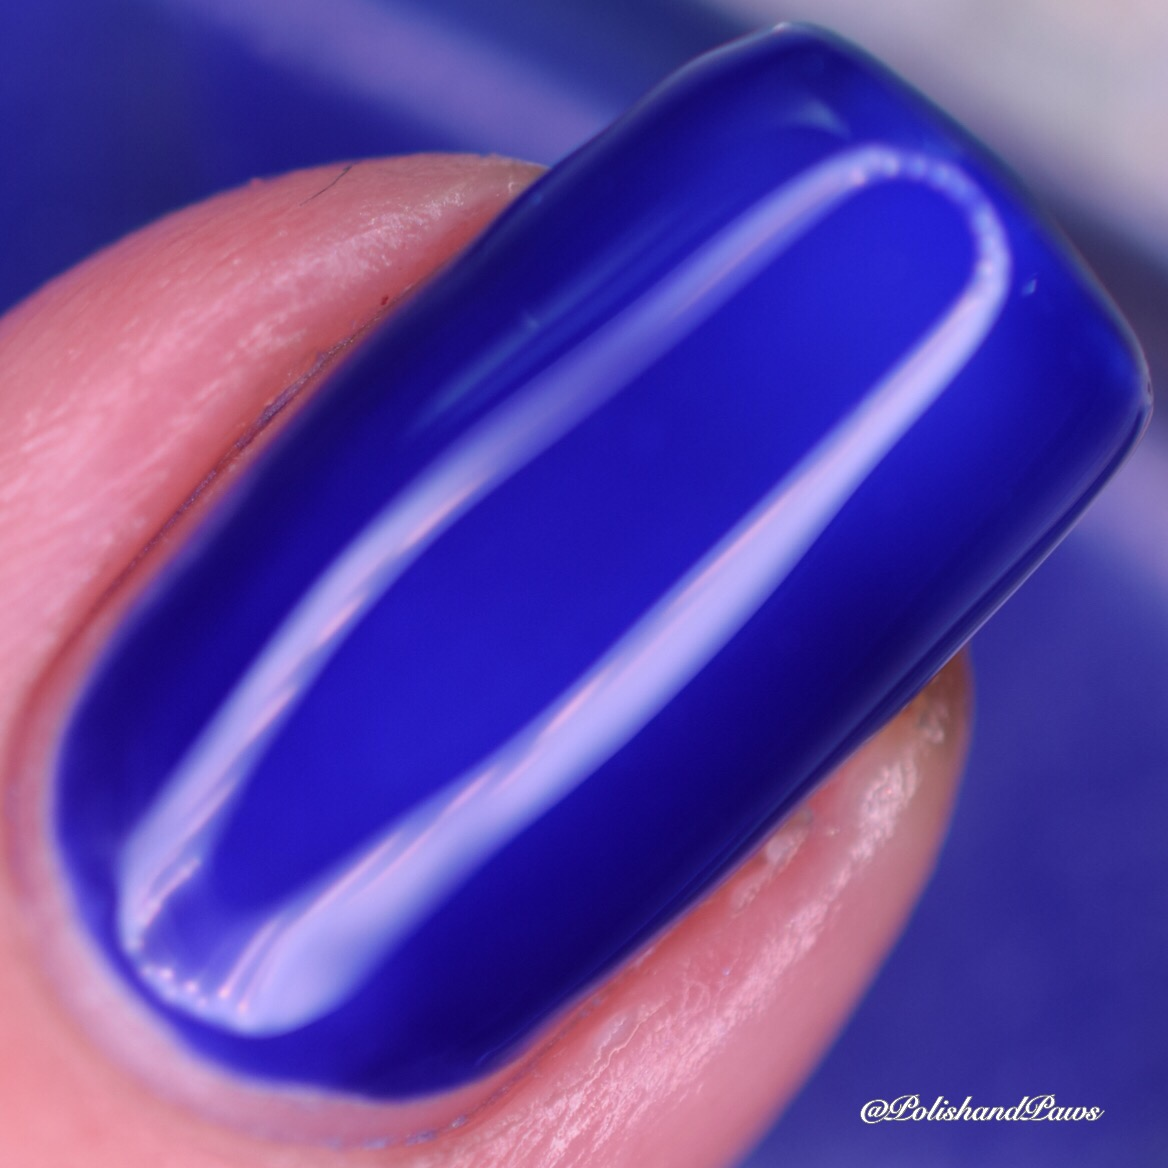 Zoya Mirajane UltraBrite Neons